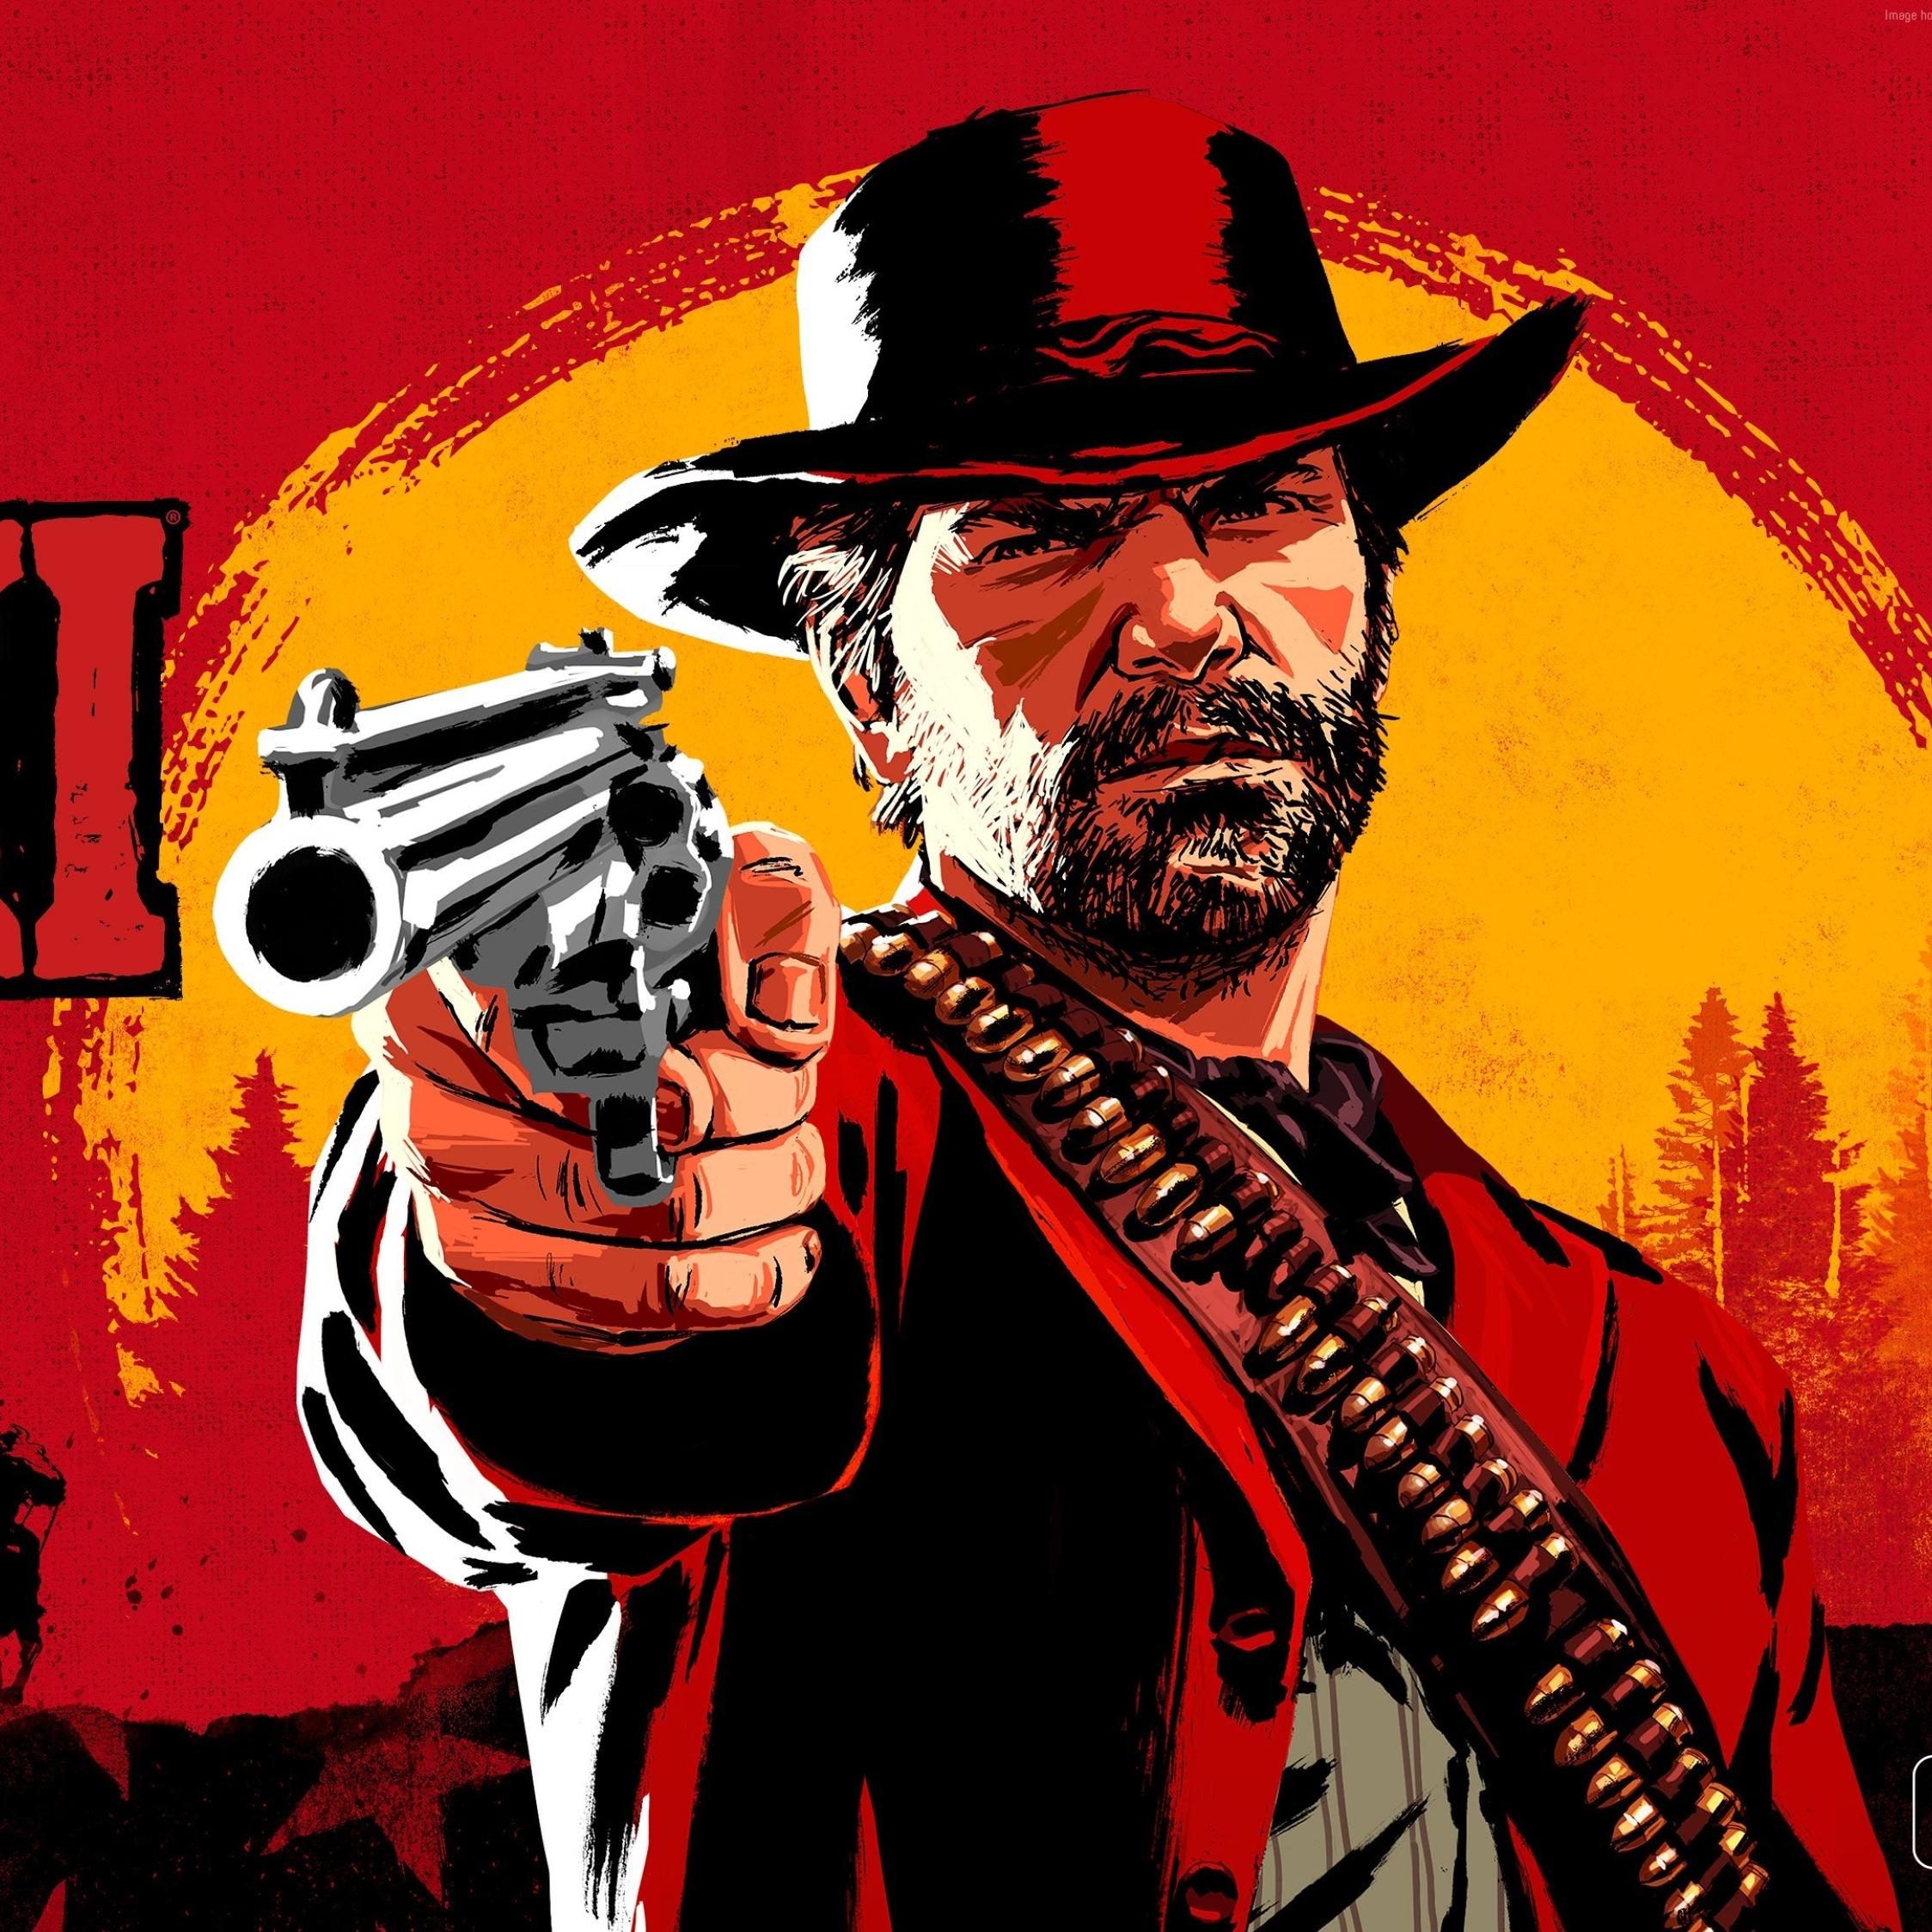 Red Dead Redemption Wallpaper Hd: Red Dead Redemption 2 Game Poster 2018, HD 4K Wallpaper